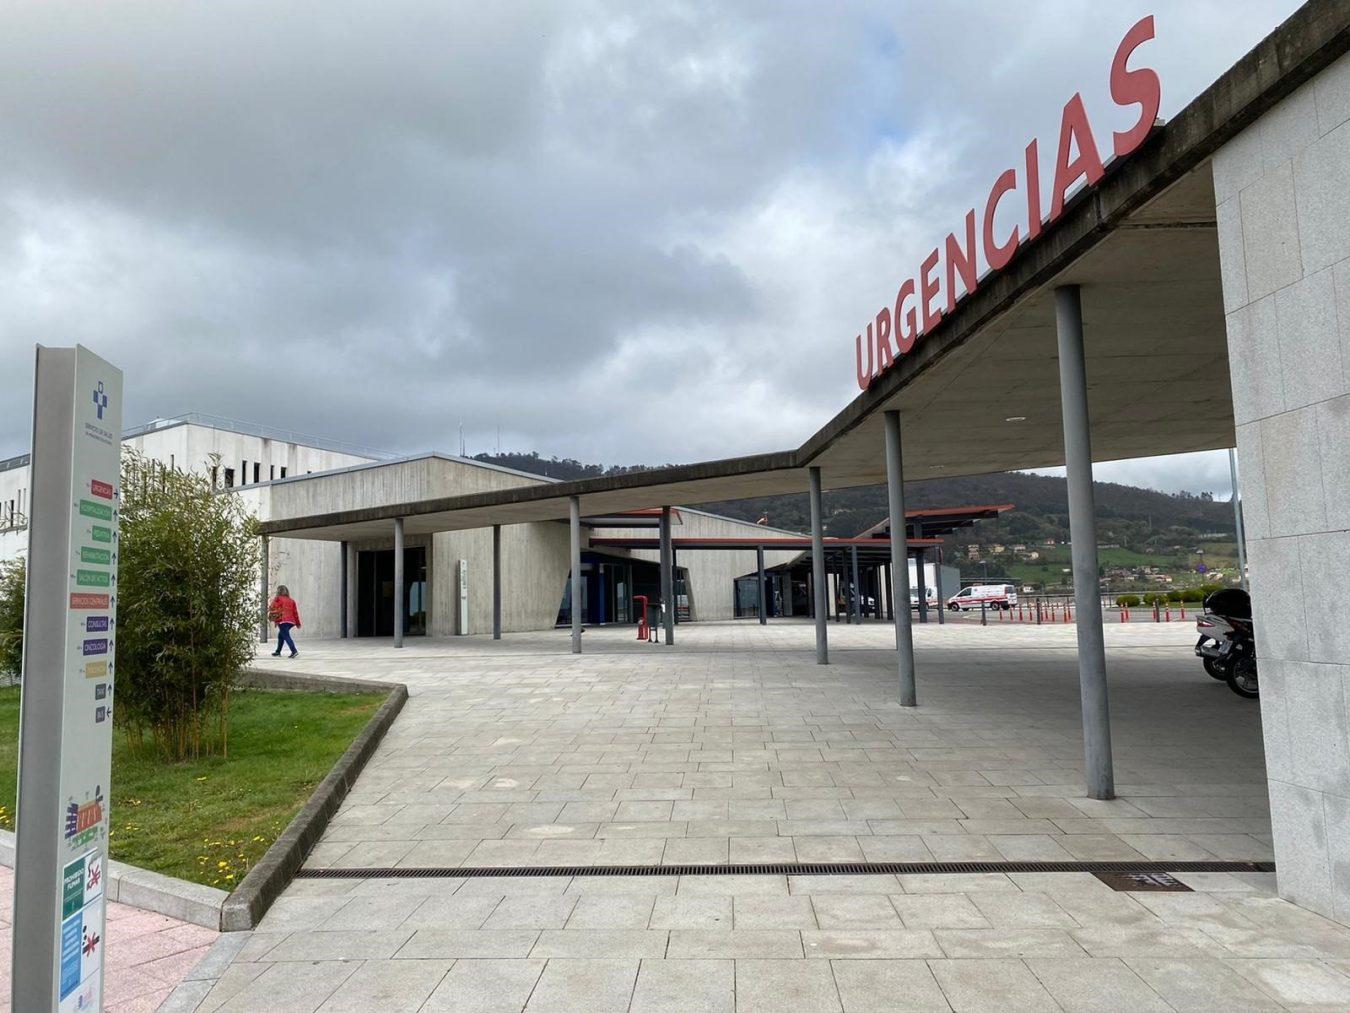 Tercer día consecutivo sin fallecidos con coronavirus en Asturias pero con subida de nuevos contagios